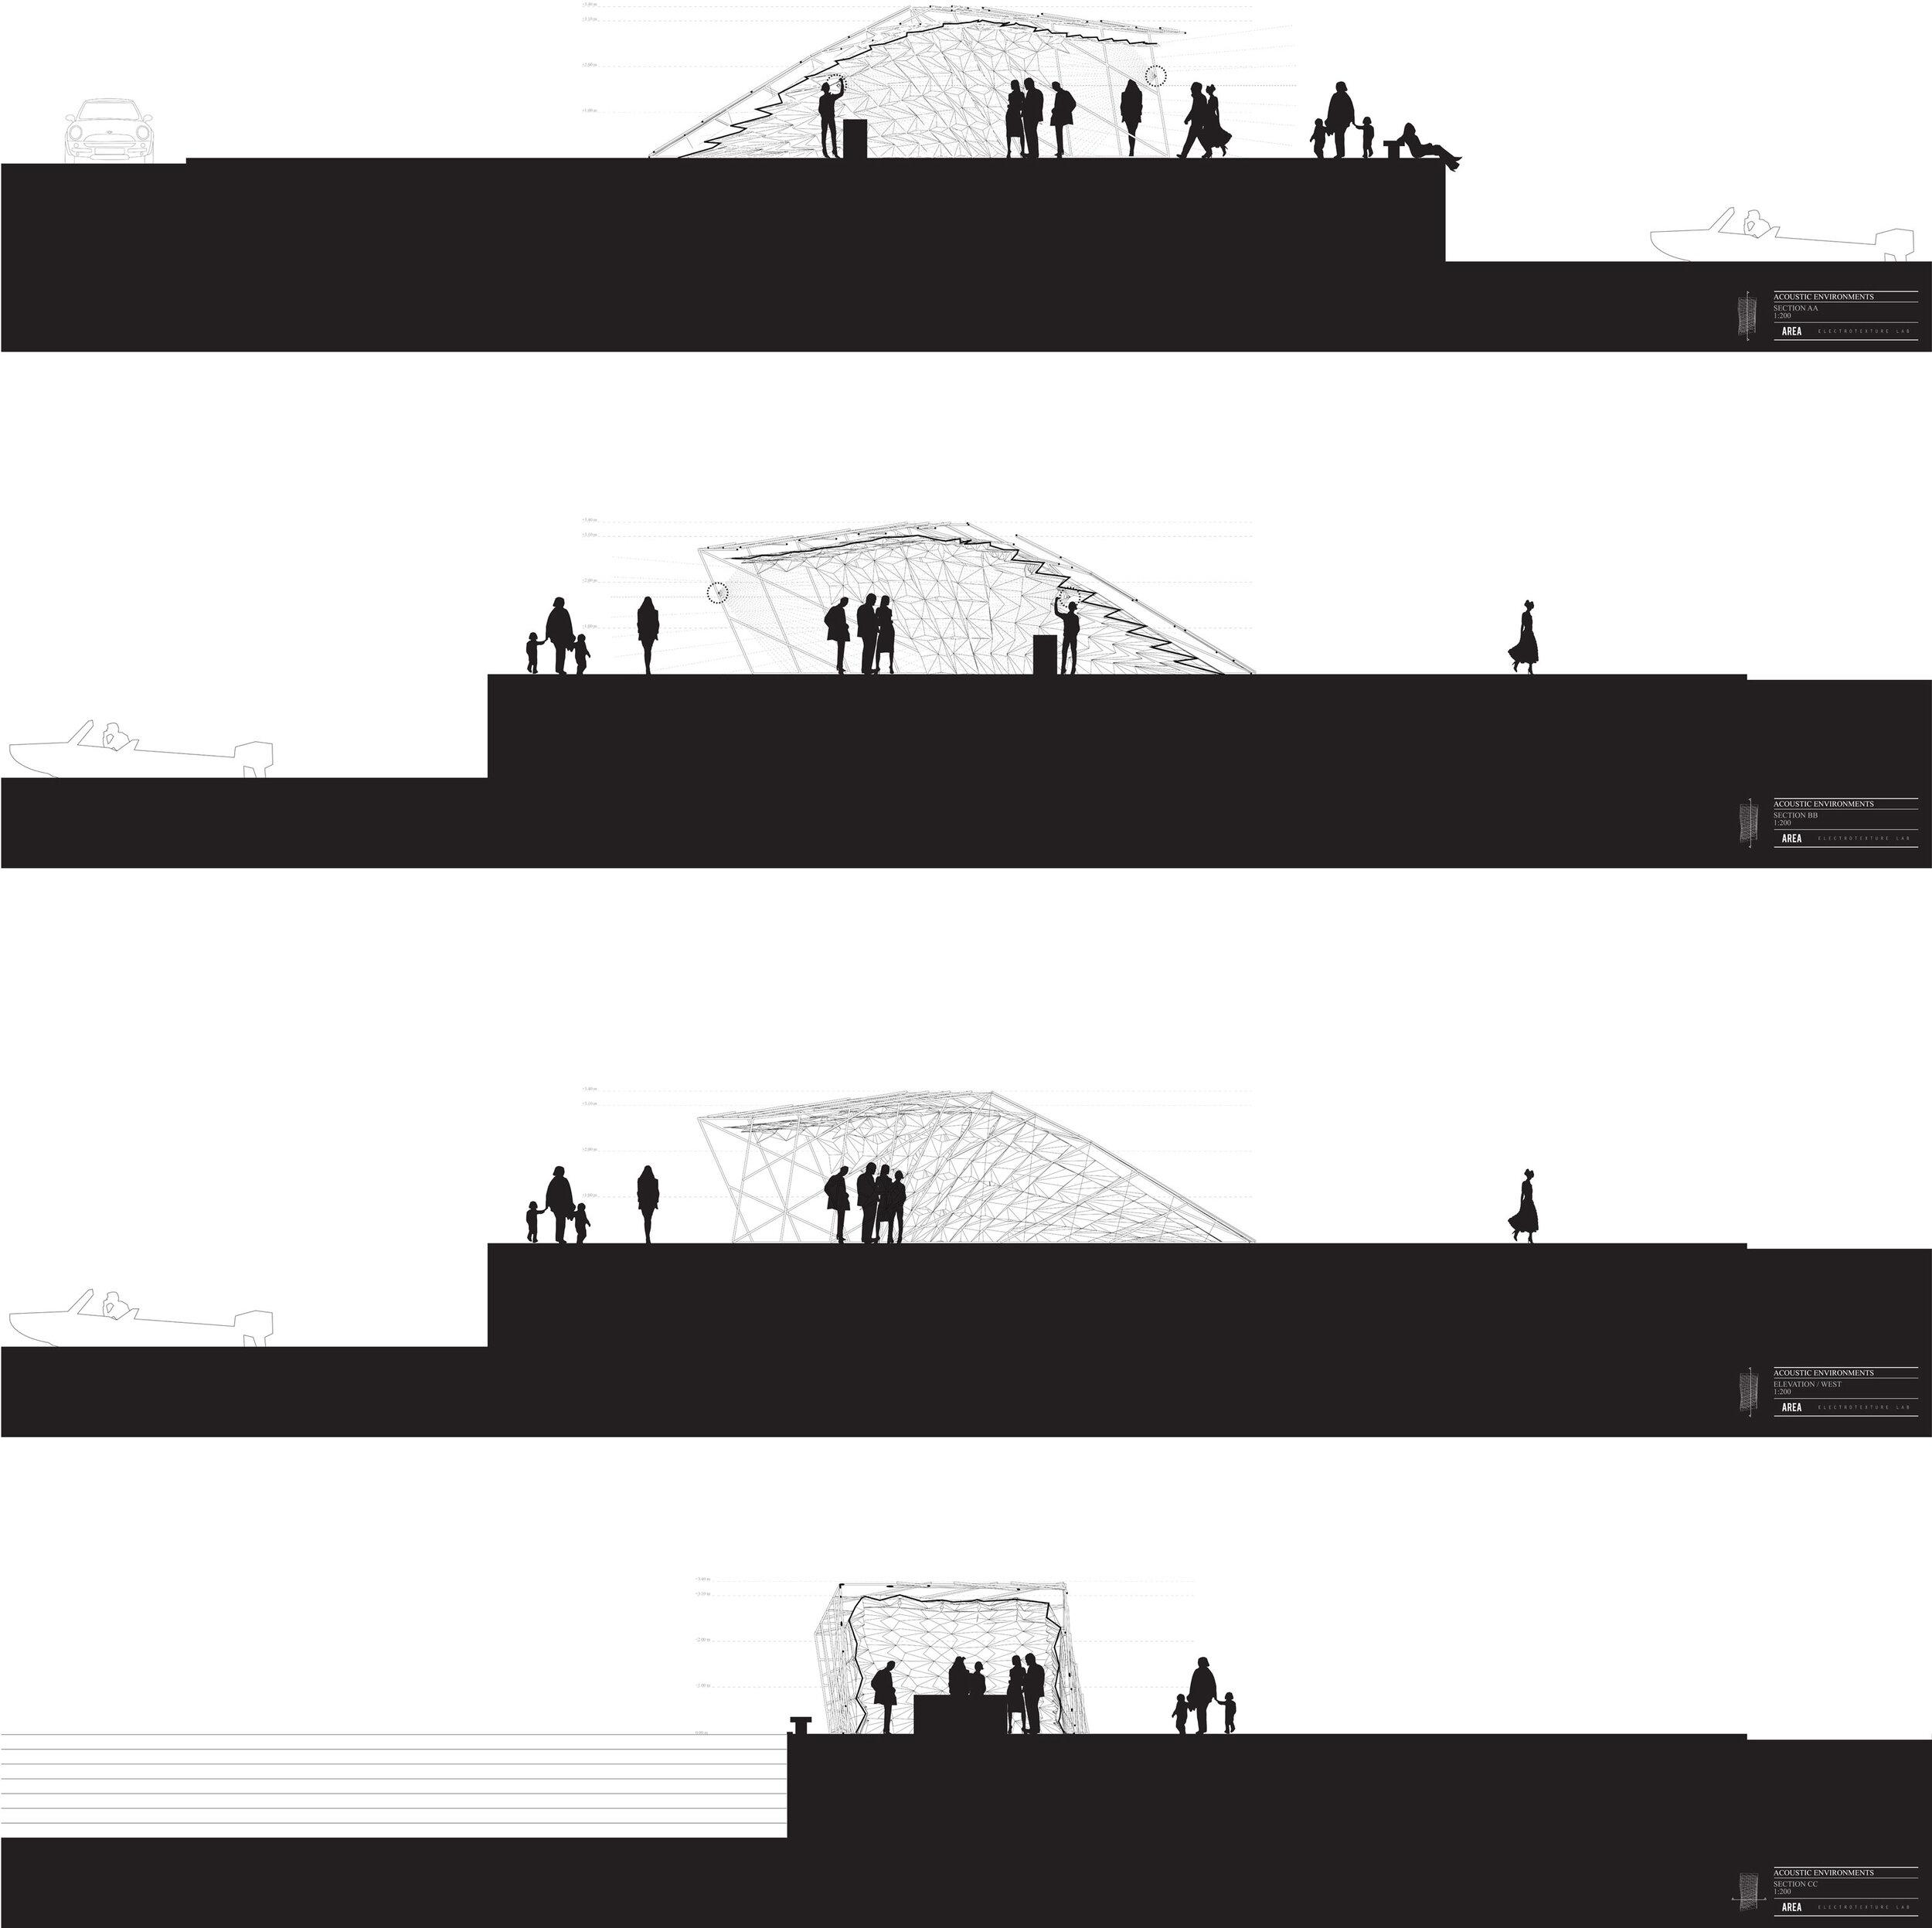 AcousticPavilion-I-6.jpg